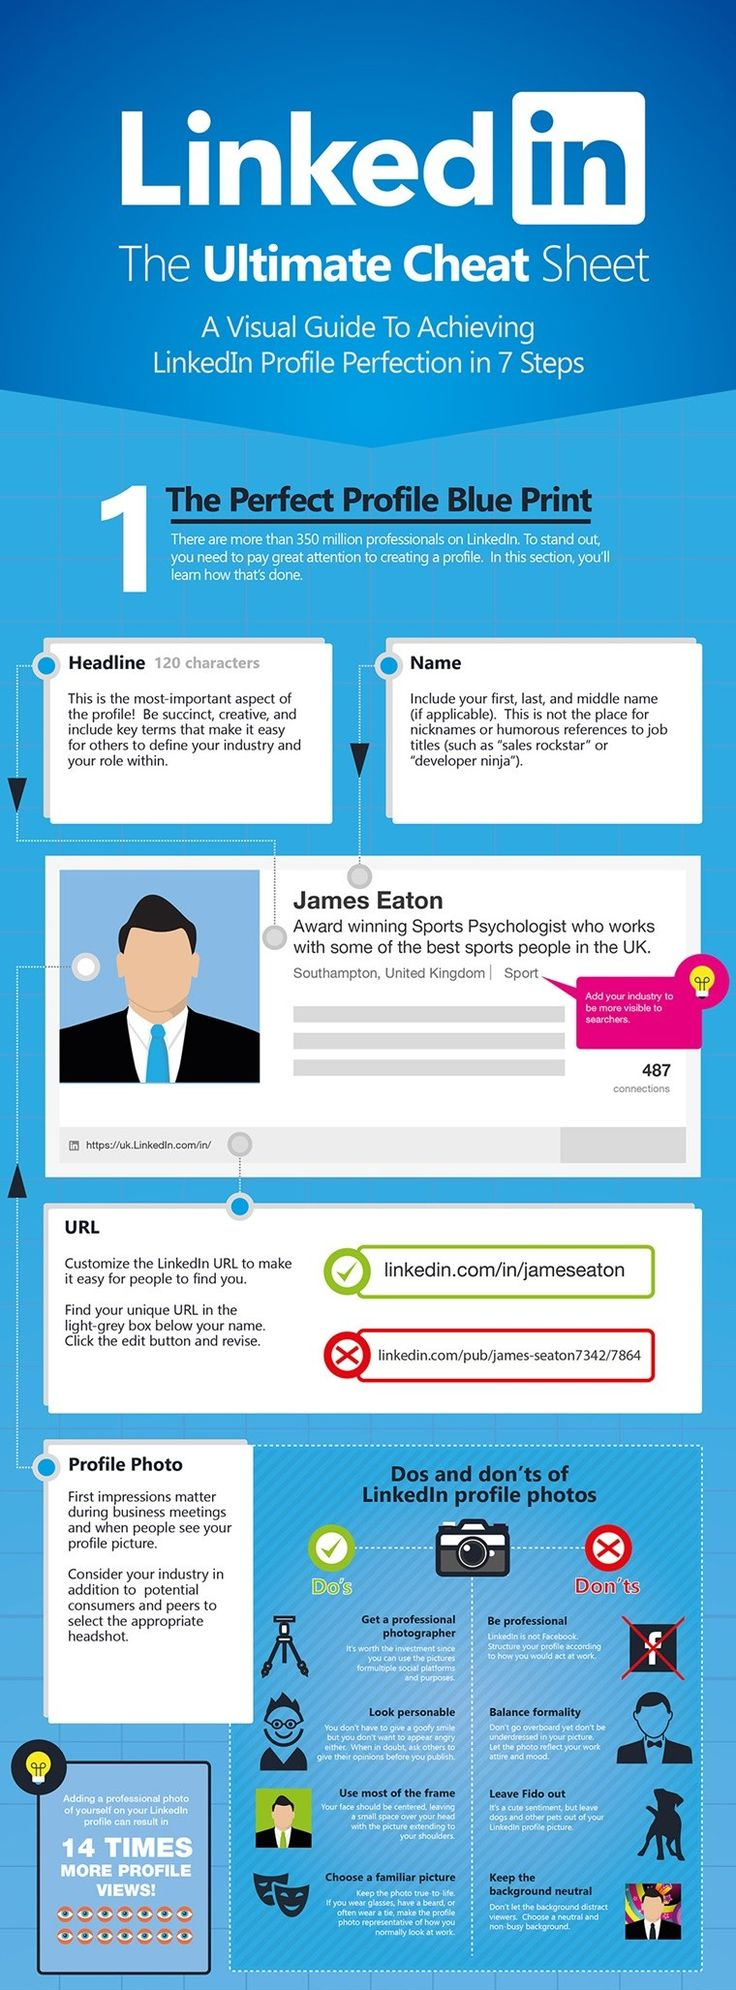 Ultimate LinkedIn Profile Cheat Sheet [Infographic] | SEJ